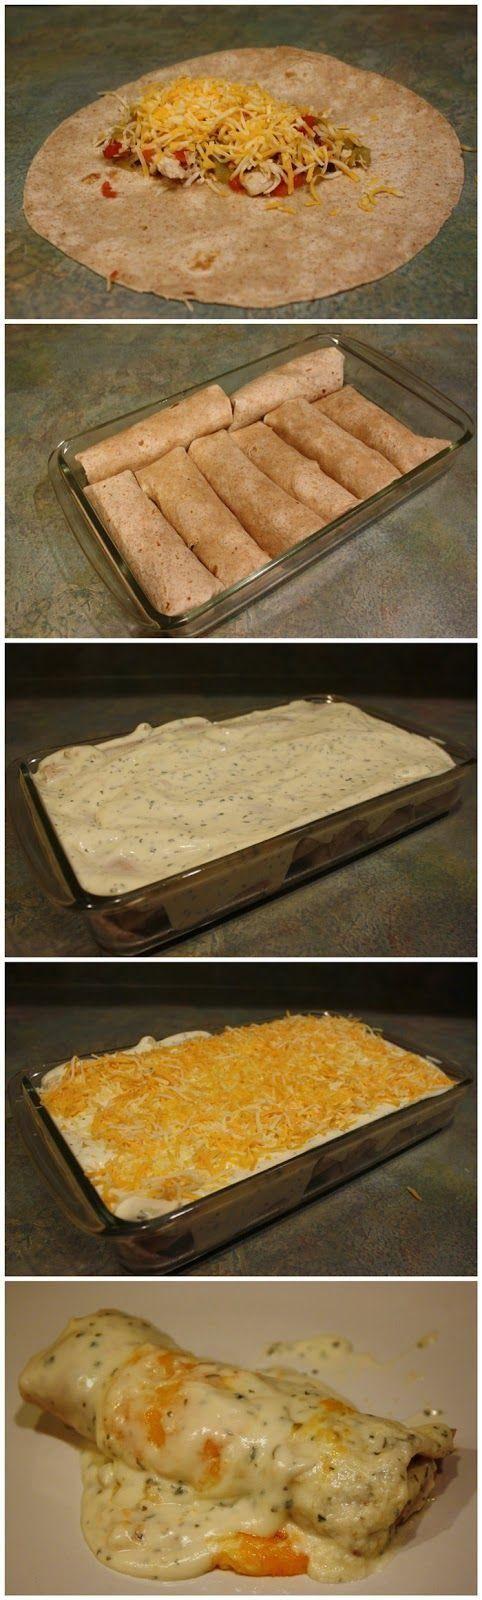 Like, Repin, Comment ;) skinny sour cream enchiladas. Like, Repin, Comment, if you like it ;)